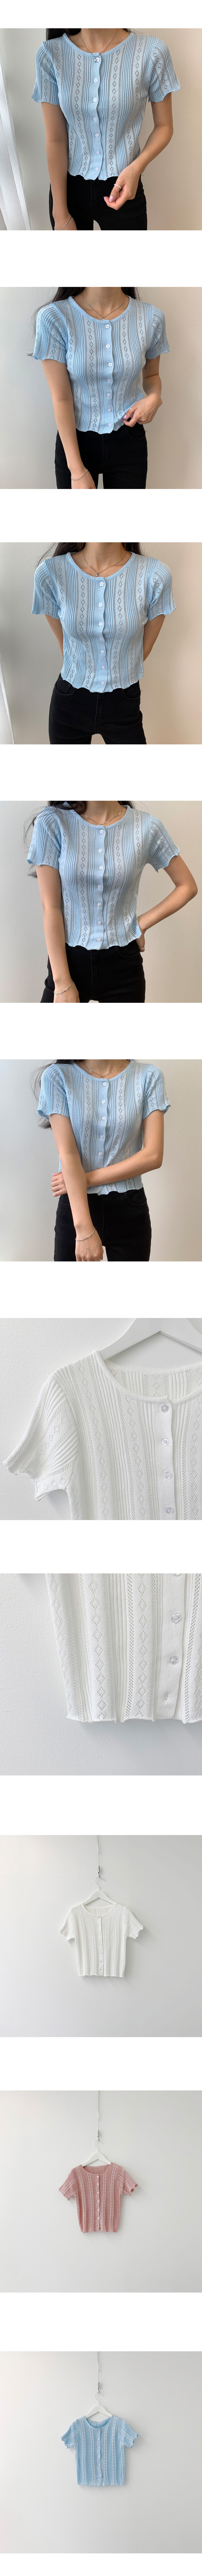 Flower button punching knit short sleeve cardigan